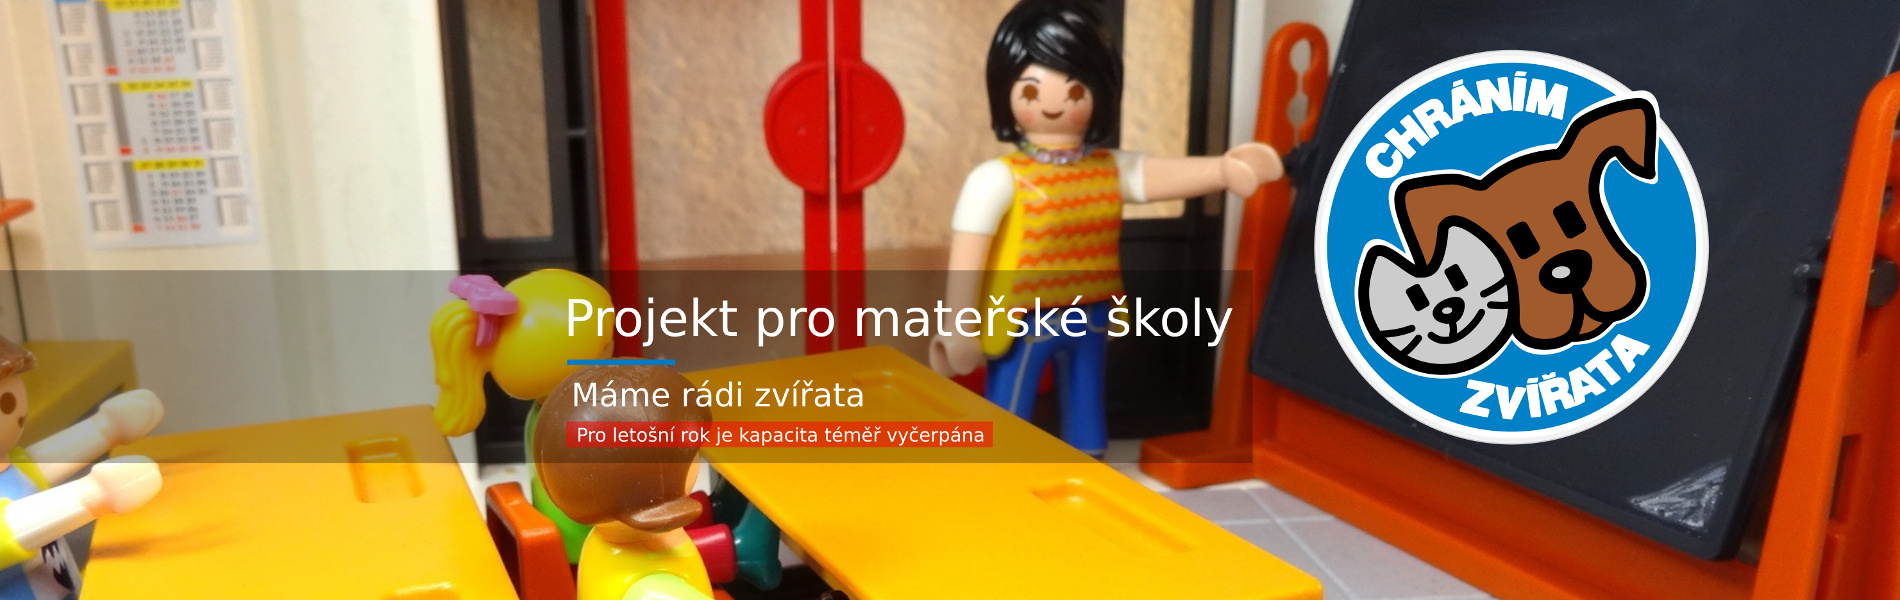 slide-skolky-kapacita